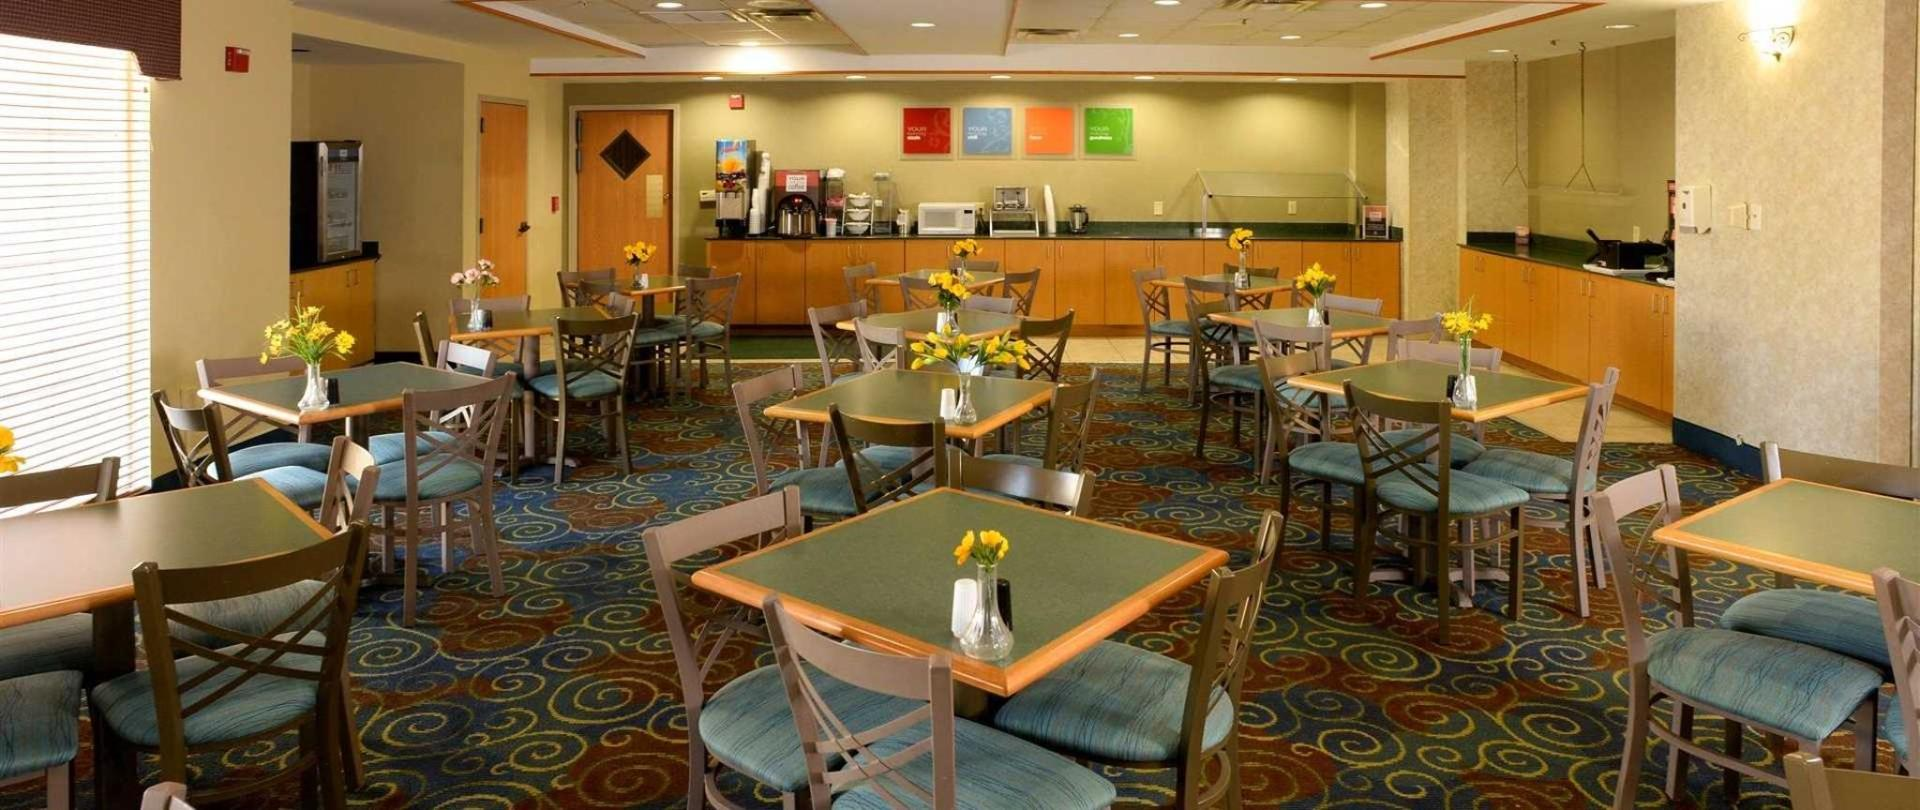 breakfast-area-rental.jpg.1920x810_default.jpeg